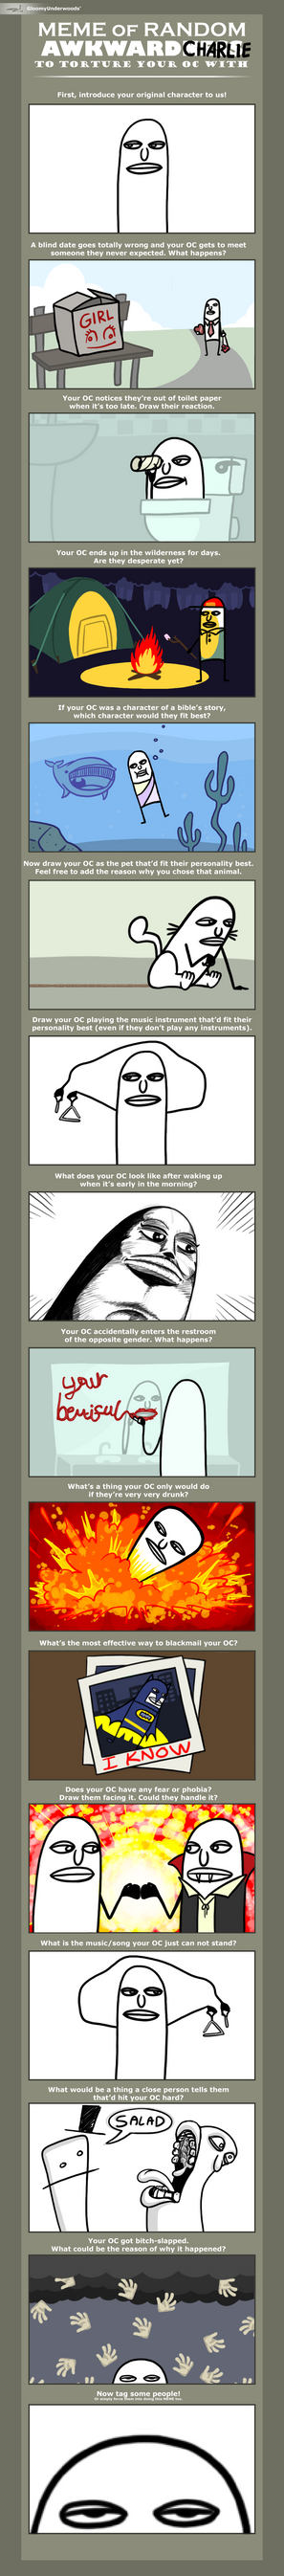 Meme of random Awkward Charlie by lnsector